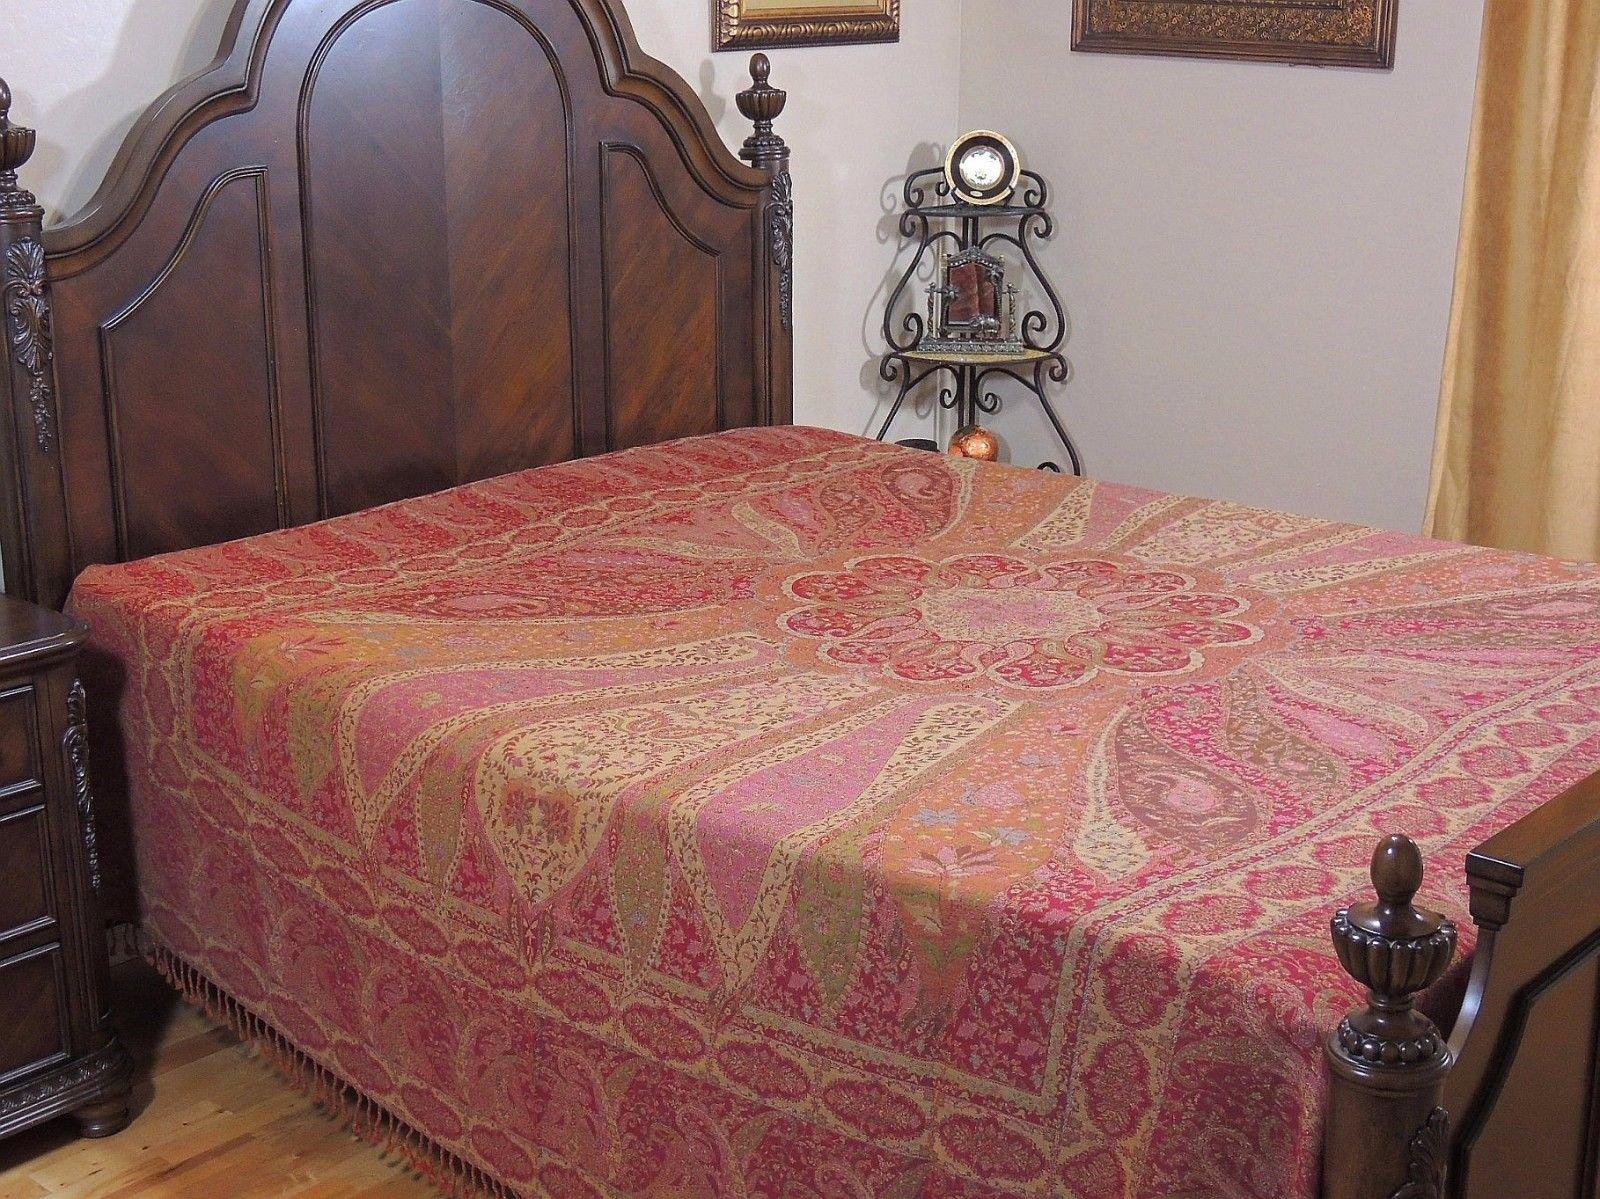 NovaHaat Pink, Beige and Tangerine Paisley 100% Wool Bedding - BAHAAR (Season of Spring) REVERSIBLE Indian Bedspread with Mughal motifs from Kashmir - Queen 108 Inch x 90 Inch or Use as Blanket Throw